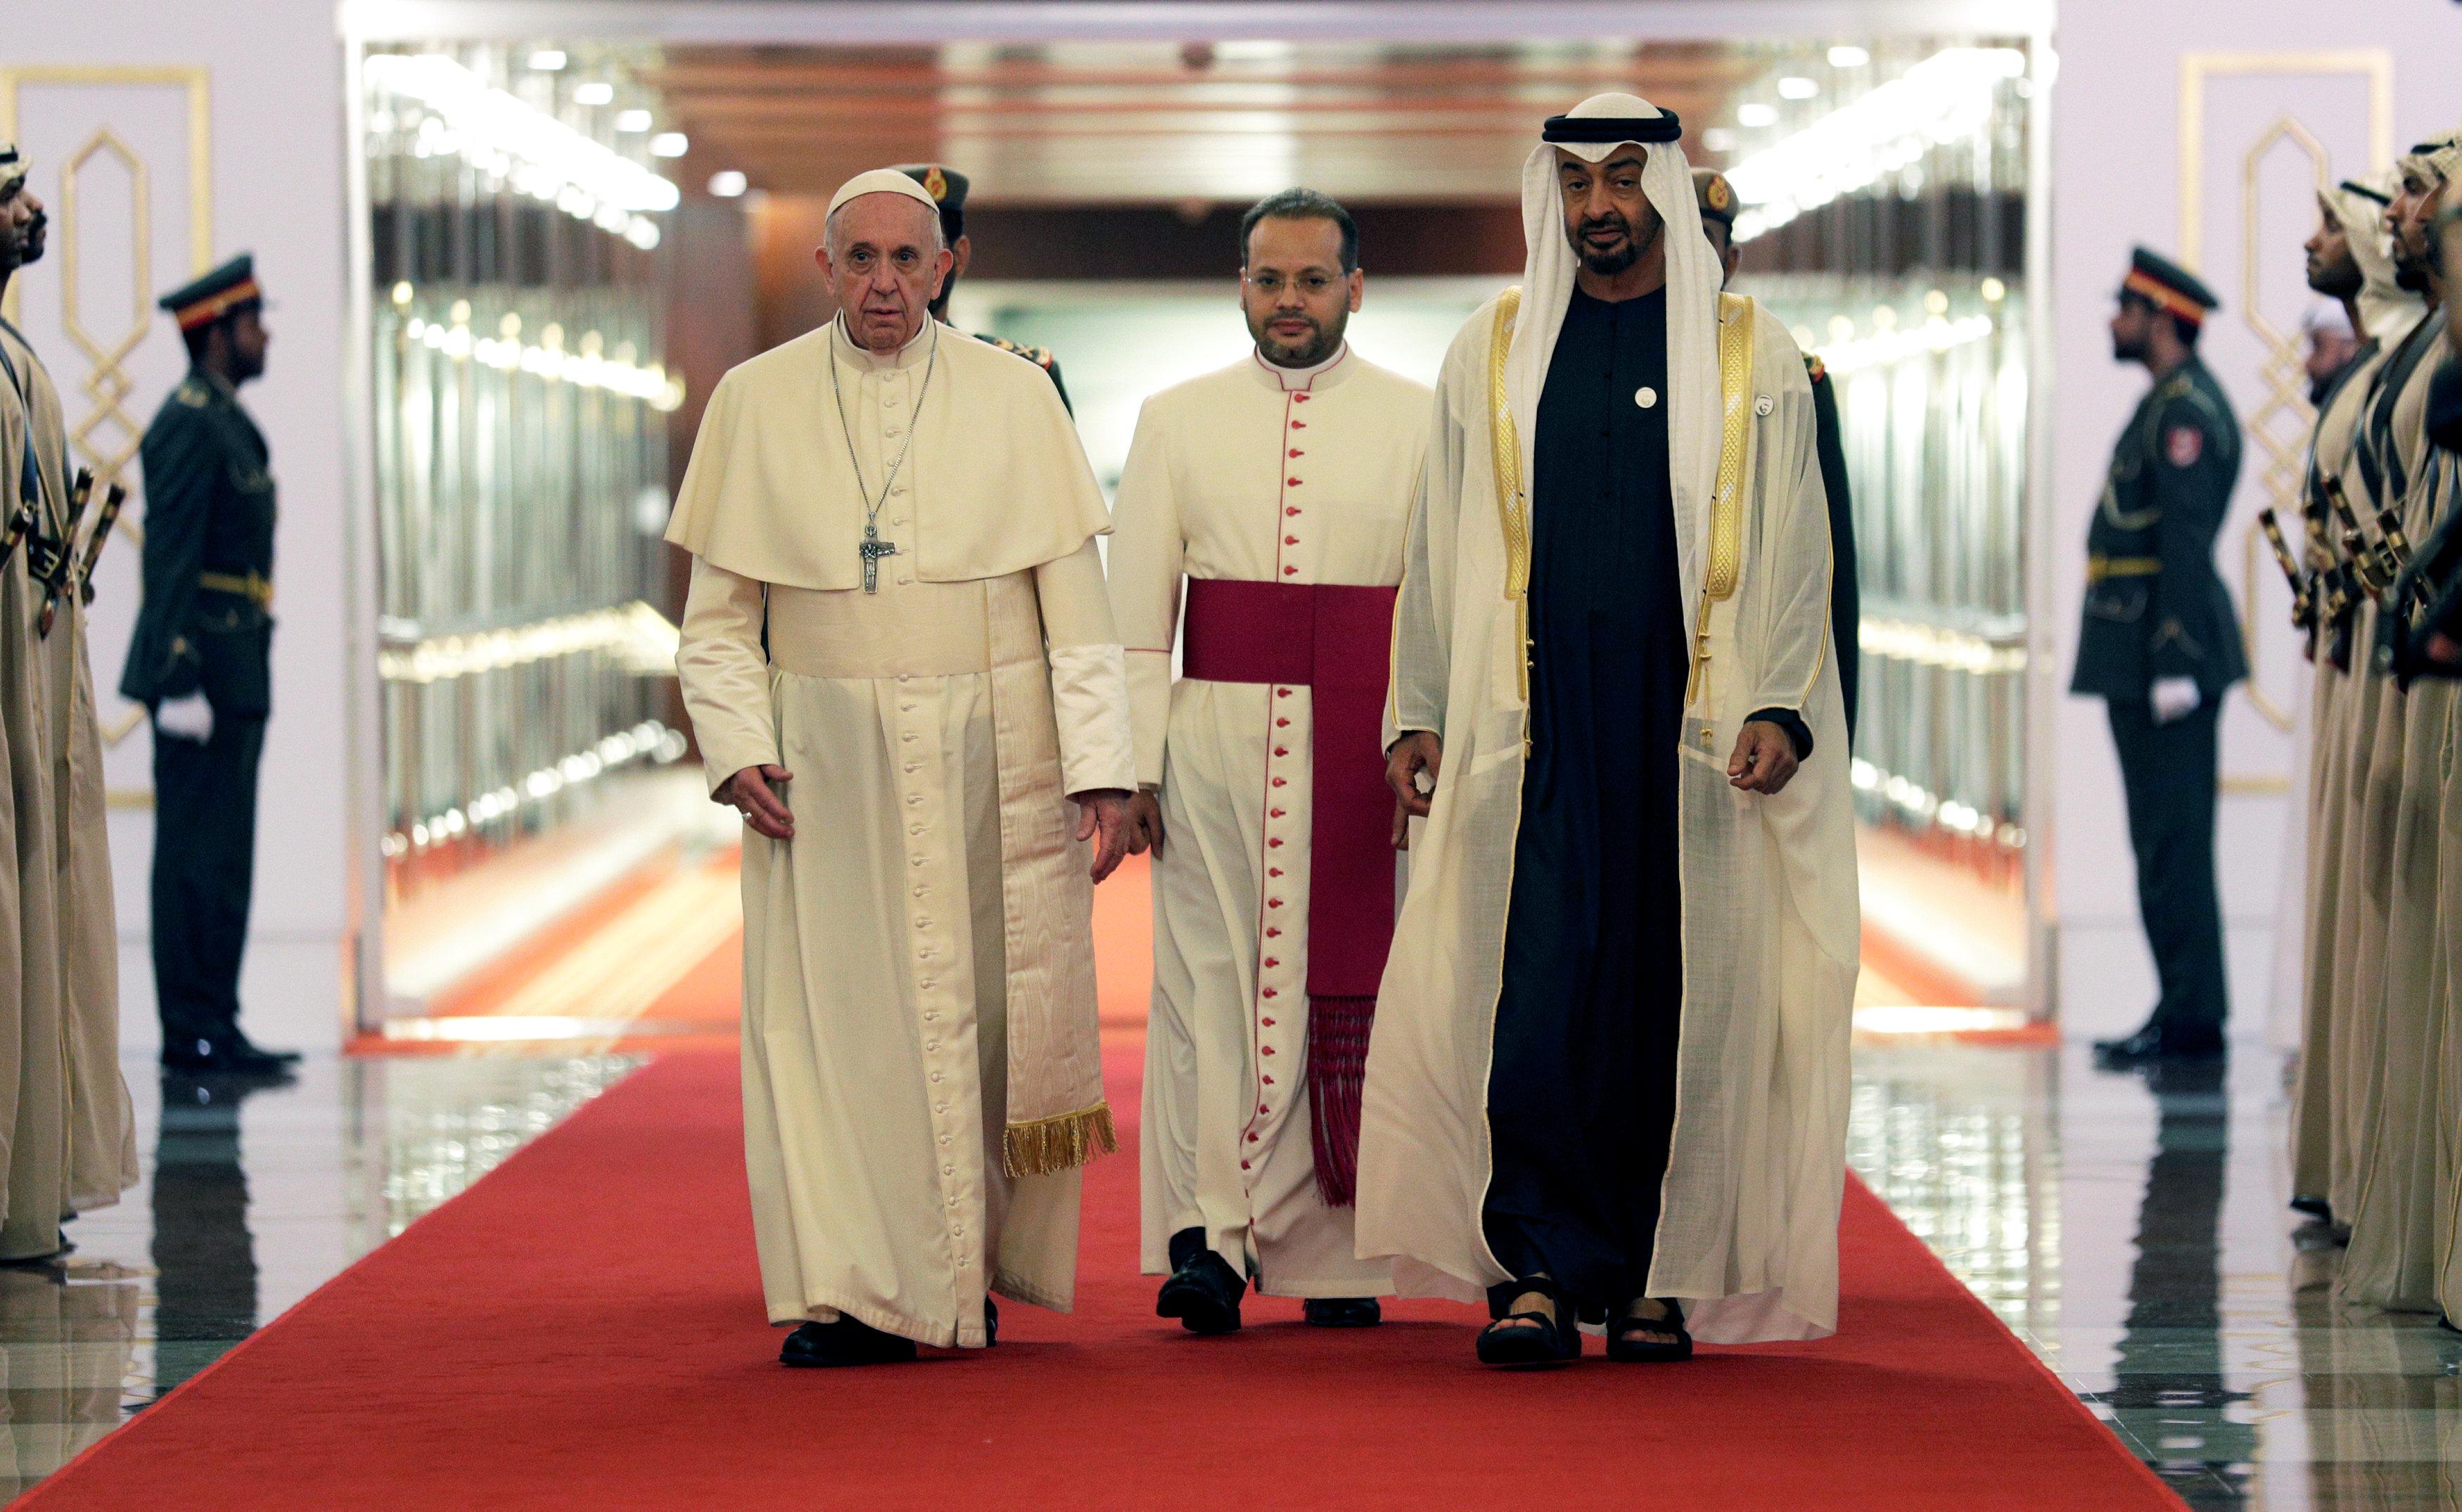 بابا الفاتيكان والشيخ محمد بن زايد